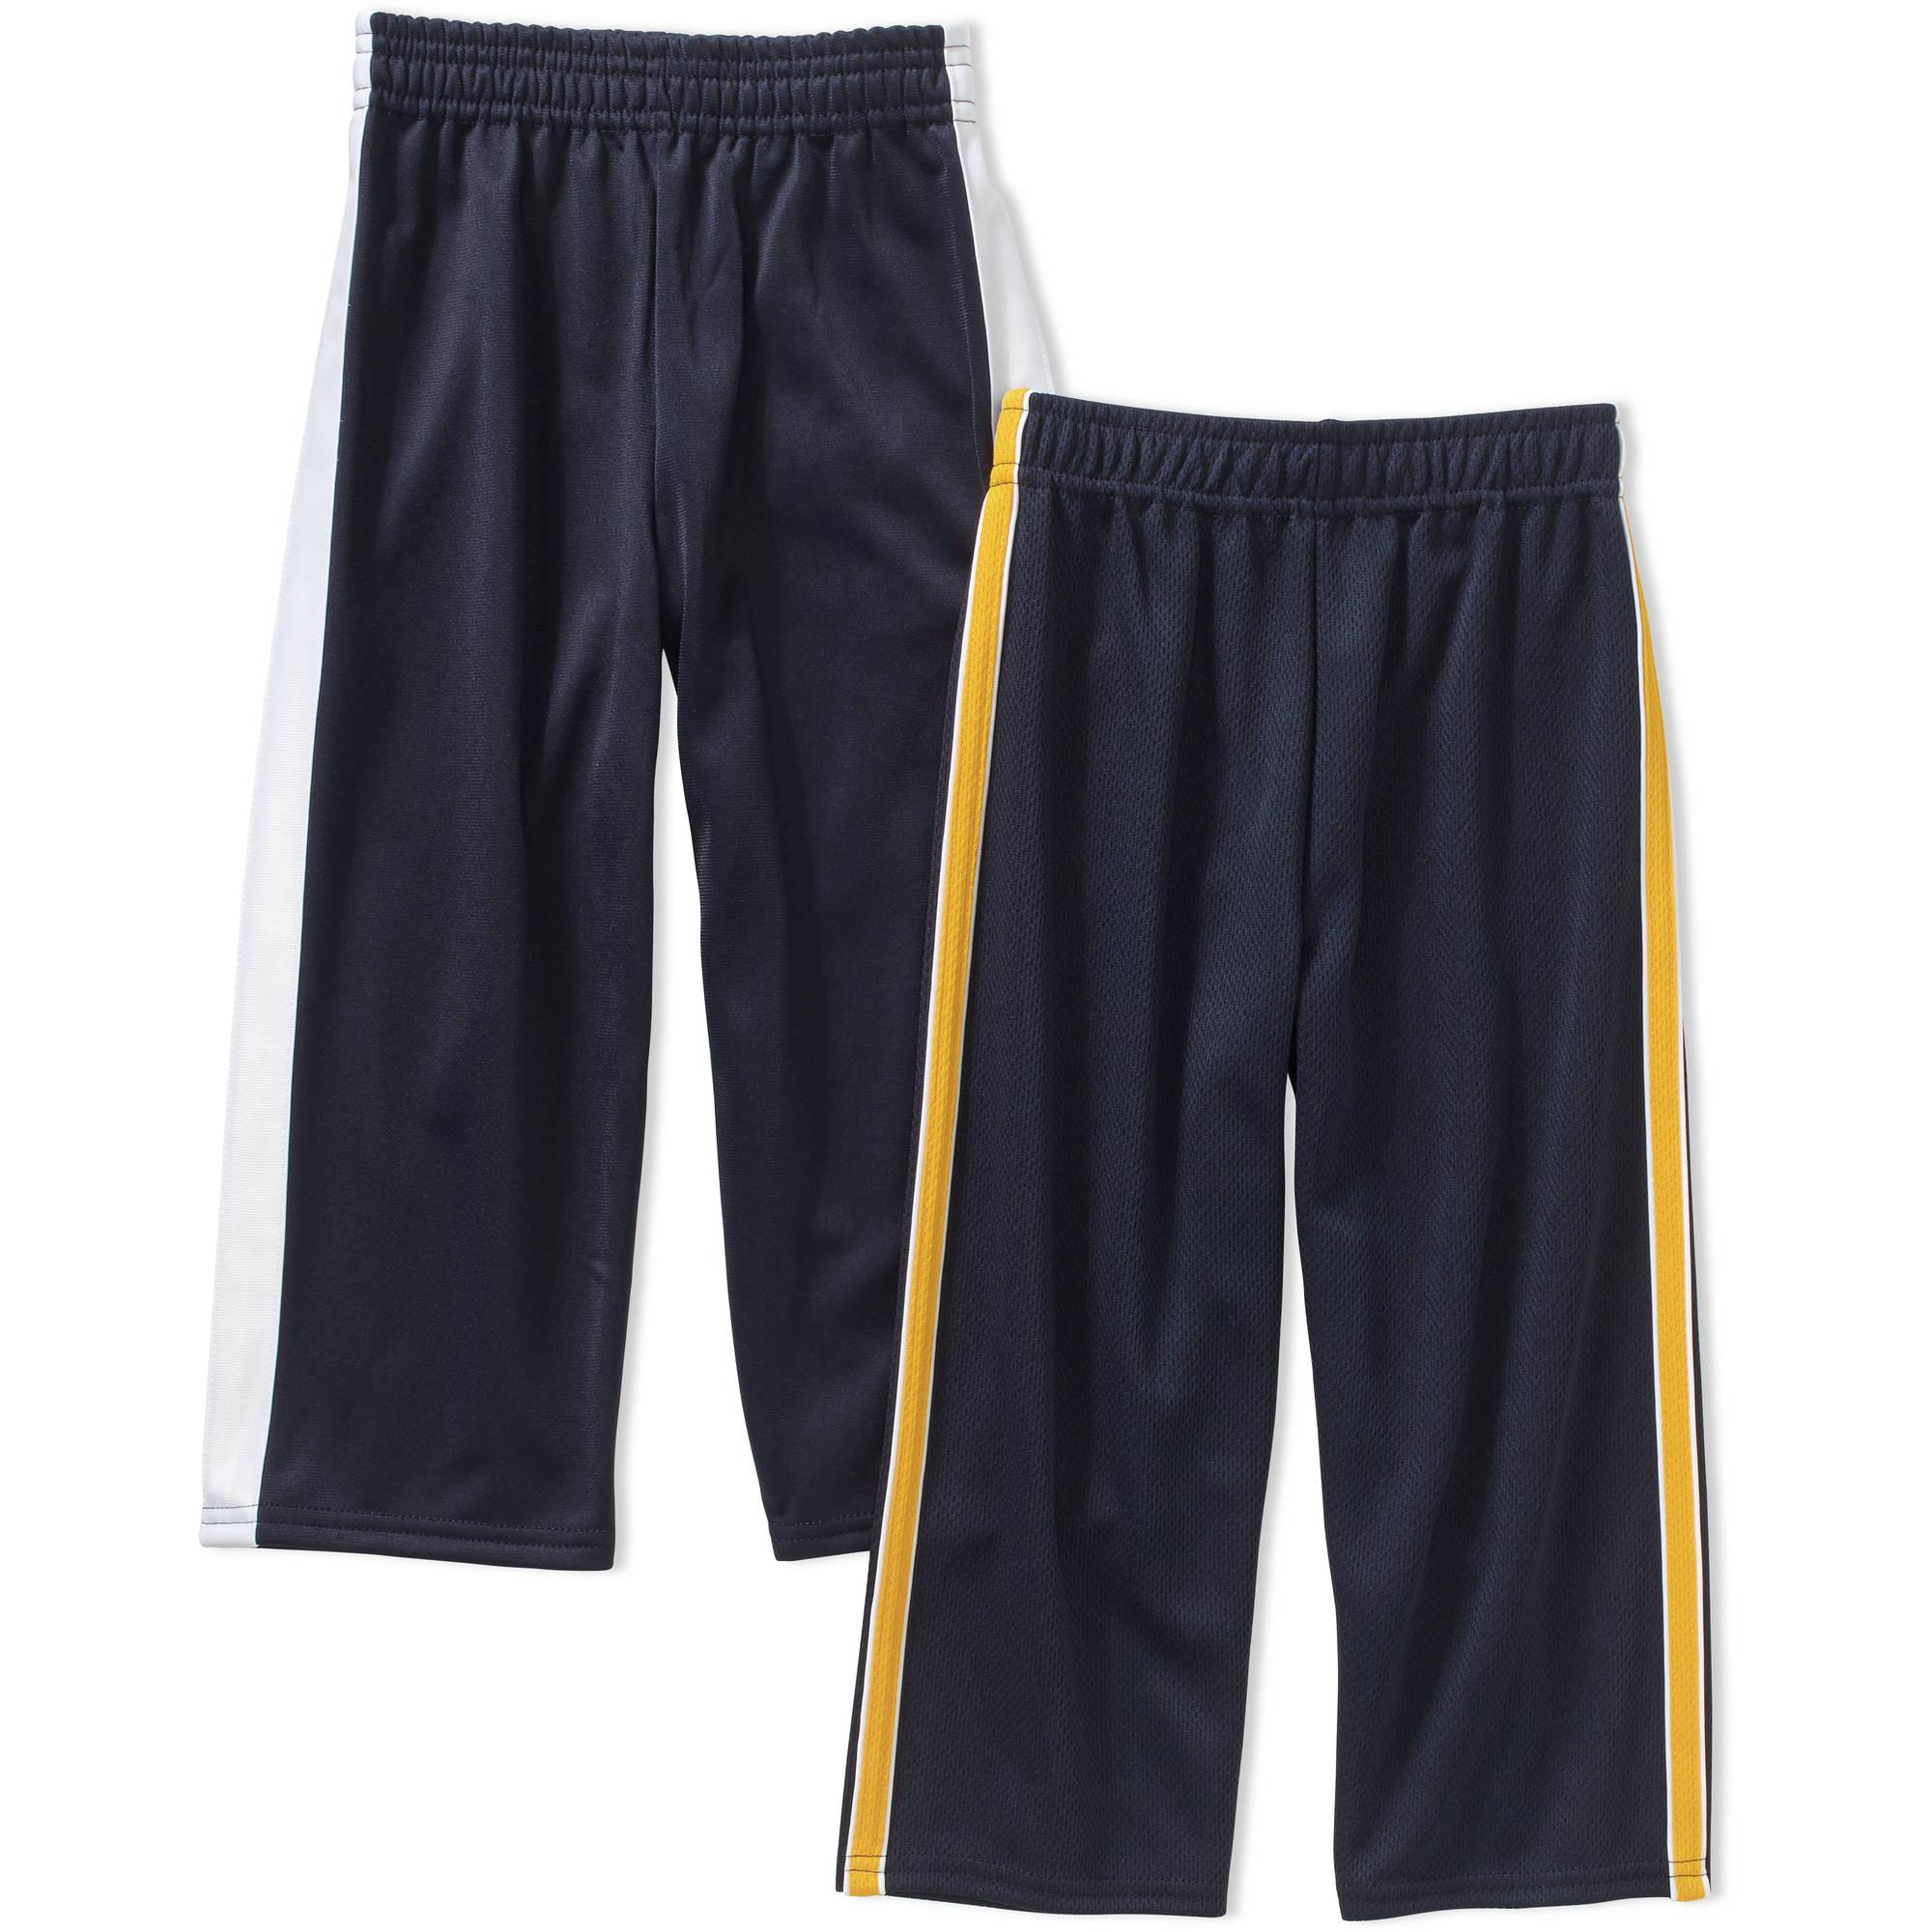 Garanimals Baby Toddler Boys' Mesh and Tricot Pants 2-Piece Set